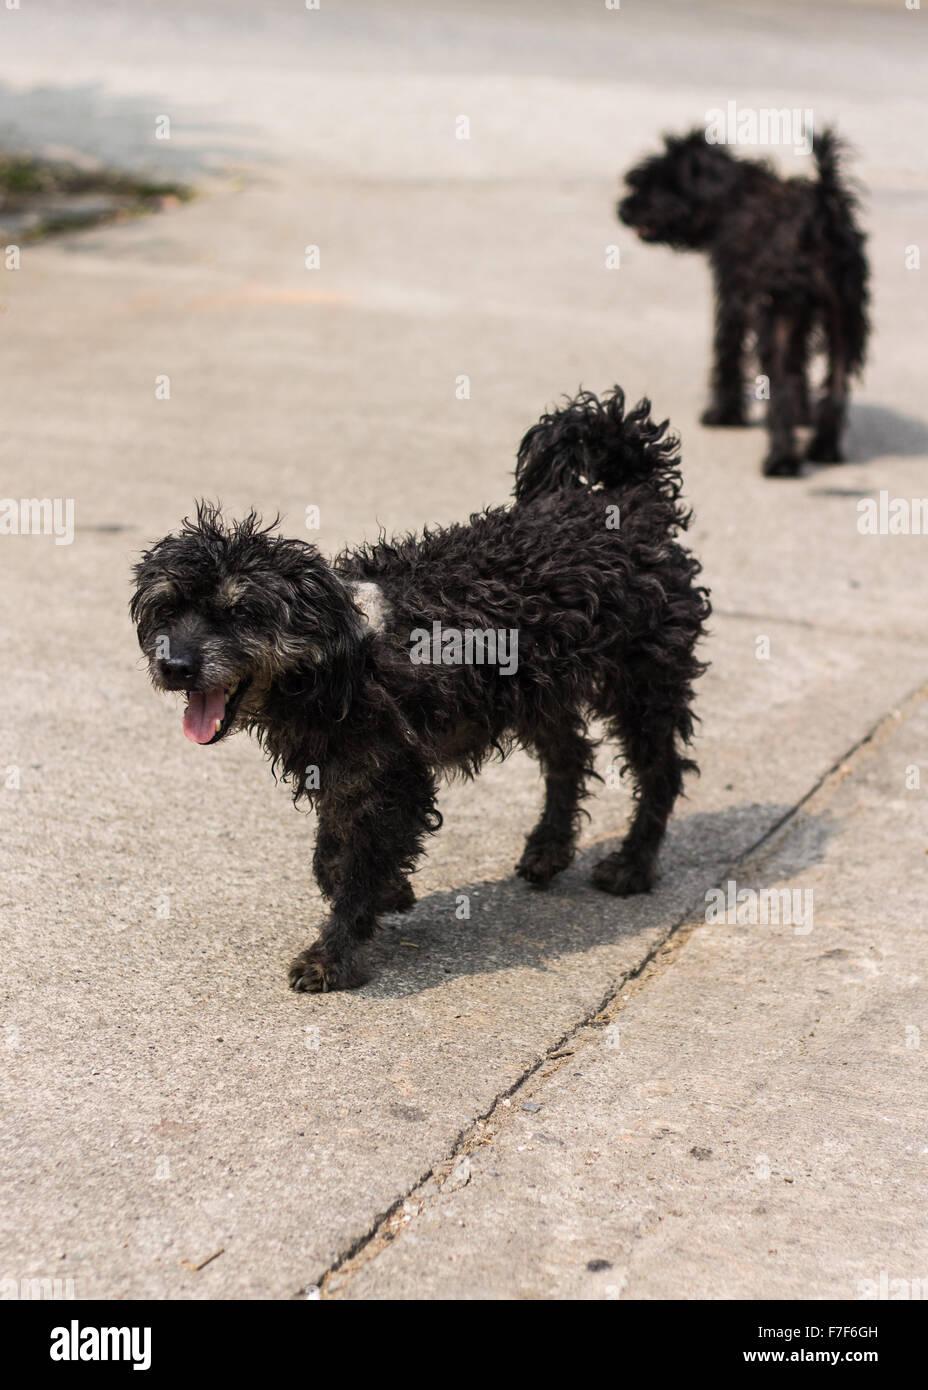 Schwarzer Zottigen Hund Pudel Mischling Stockfotografie Alamy